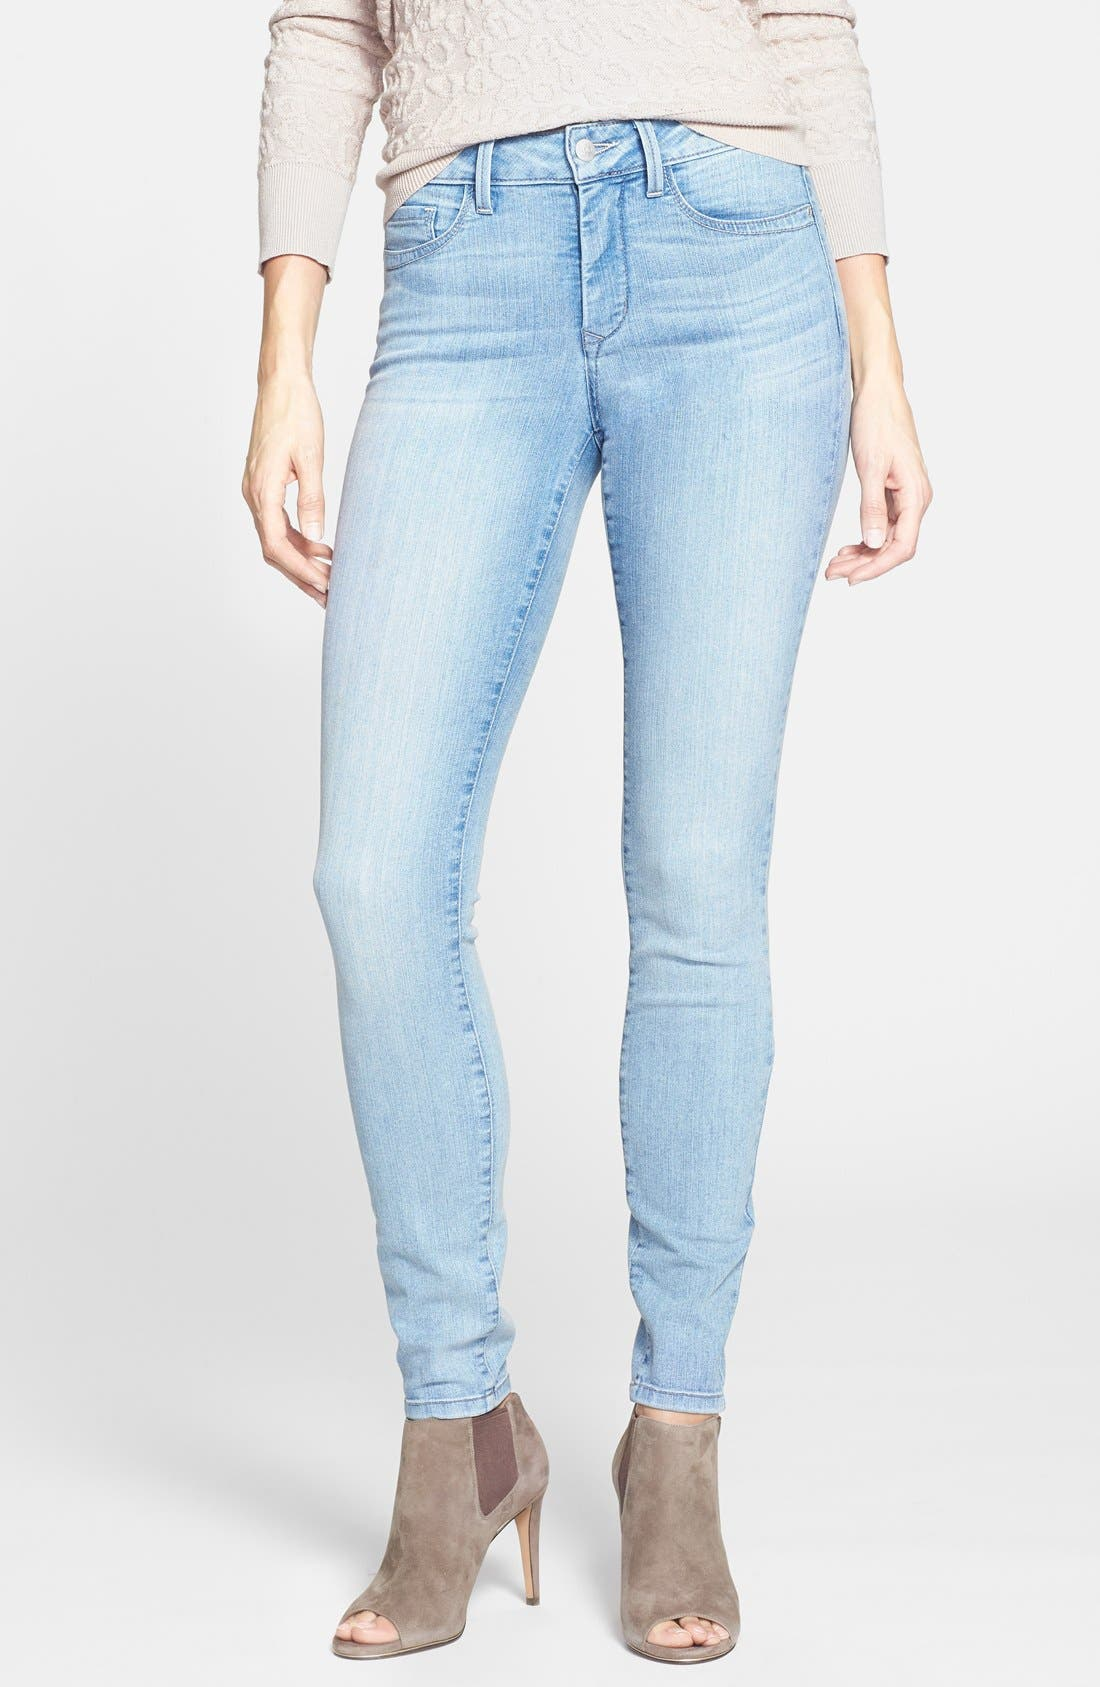 Alternate Image 1 Selected - NYDJ 'Ami' Stretch Skinny Jeans (Manhattan Beach)